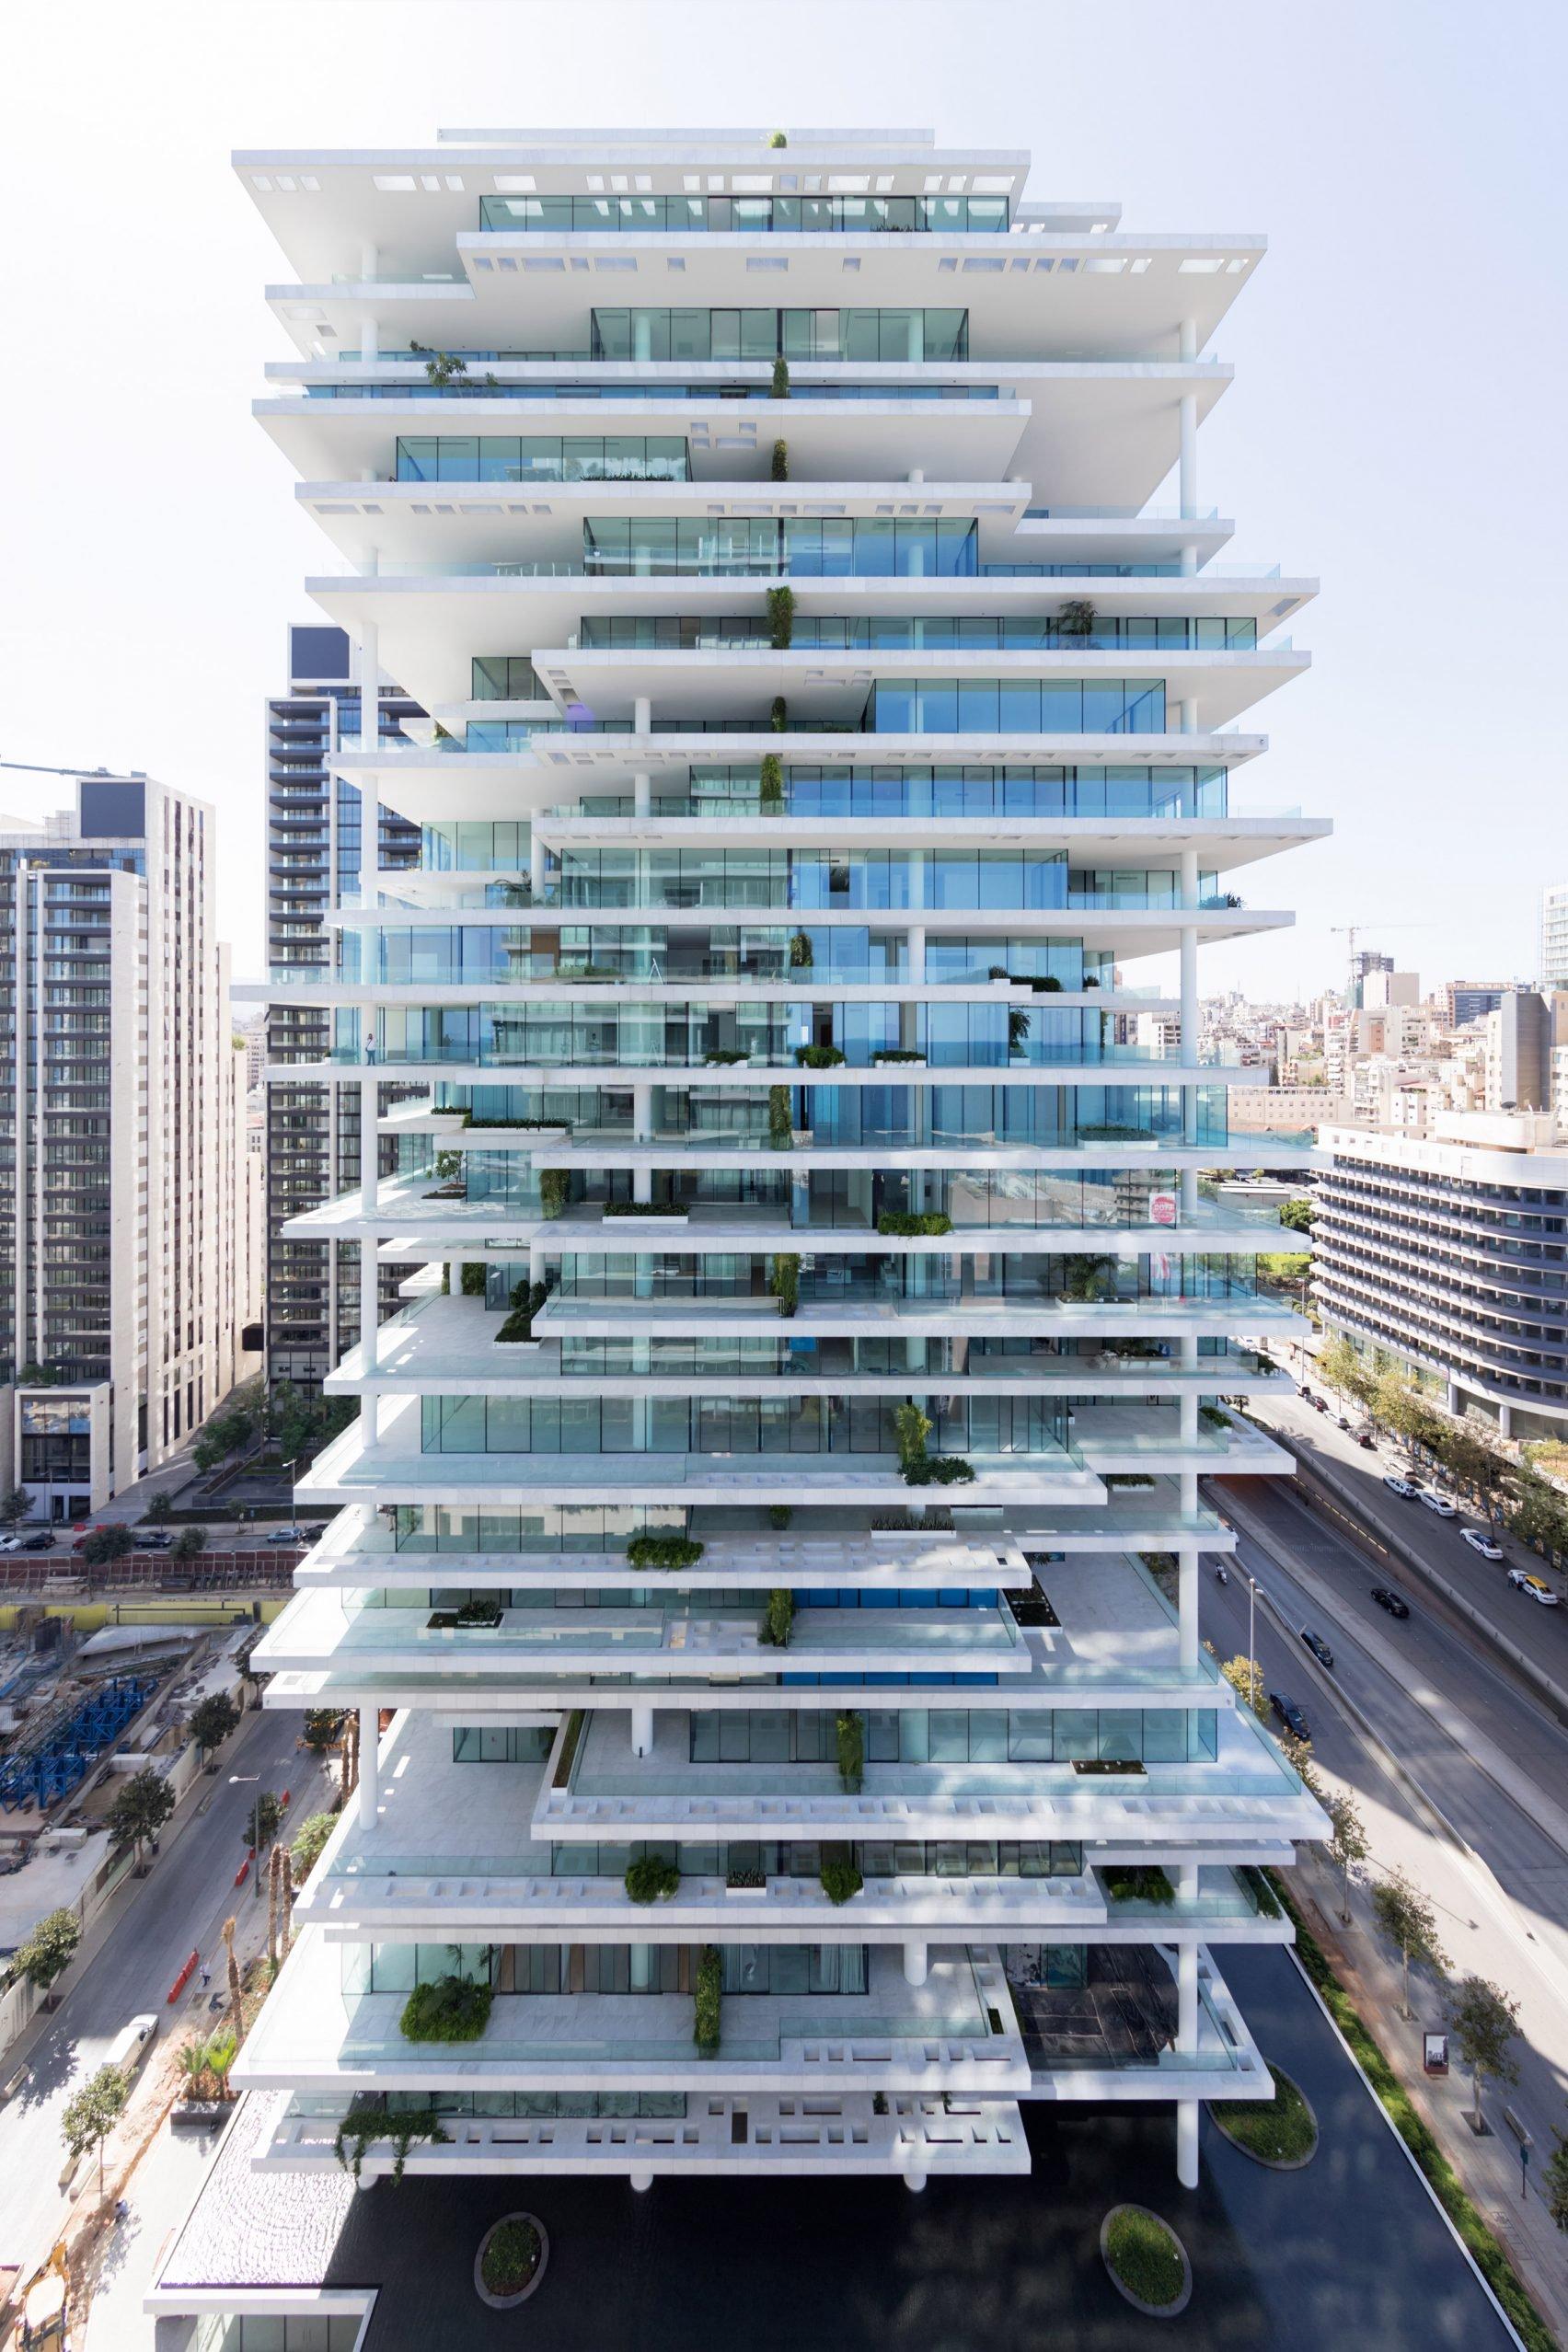 beirut-terraces-herzog-de-meuron-architecture-residential-lebanon_dezeen_2364_col_3-1704x2556.jpg